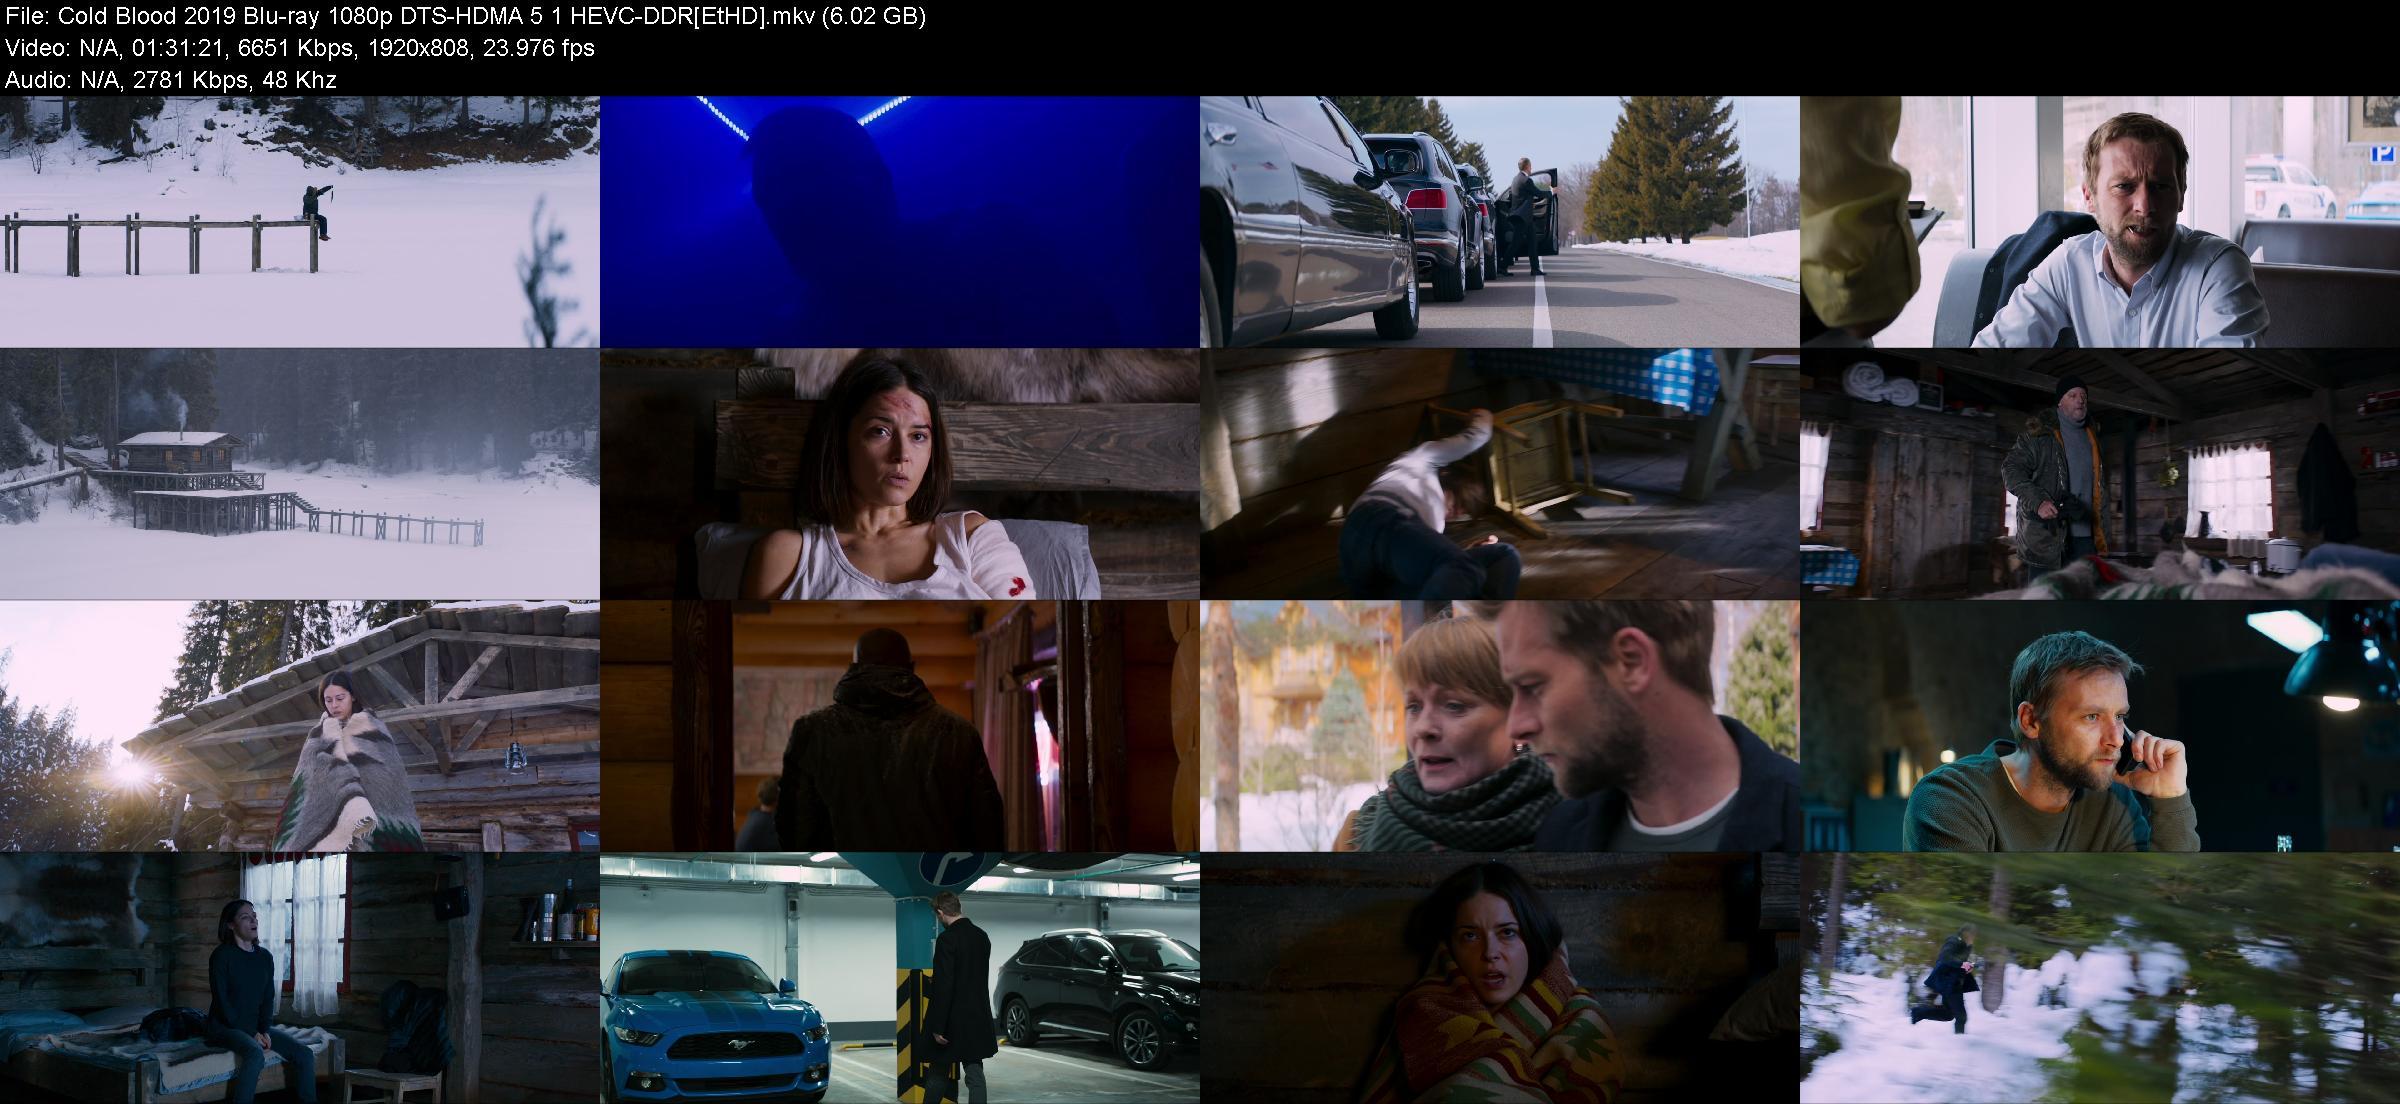 Cold Blood 2019 Blu-ray 1080p DTS-HDMA 5 1 HEVC-DDR